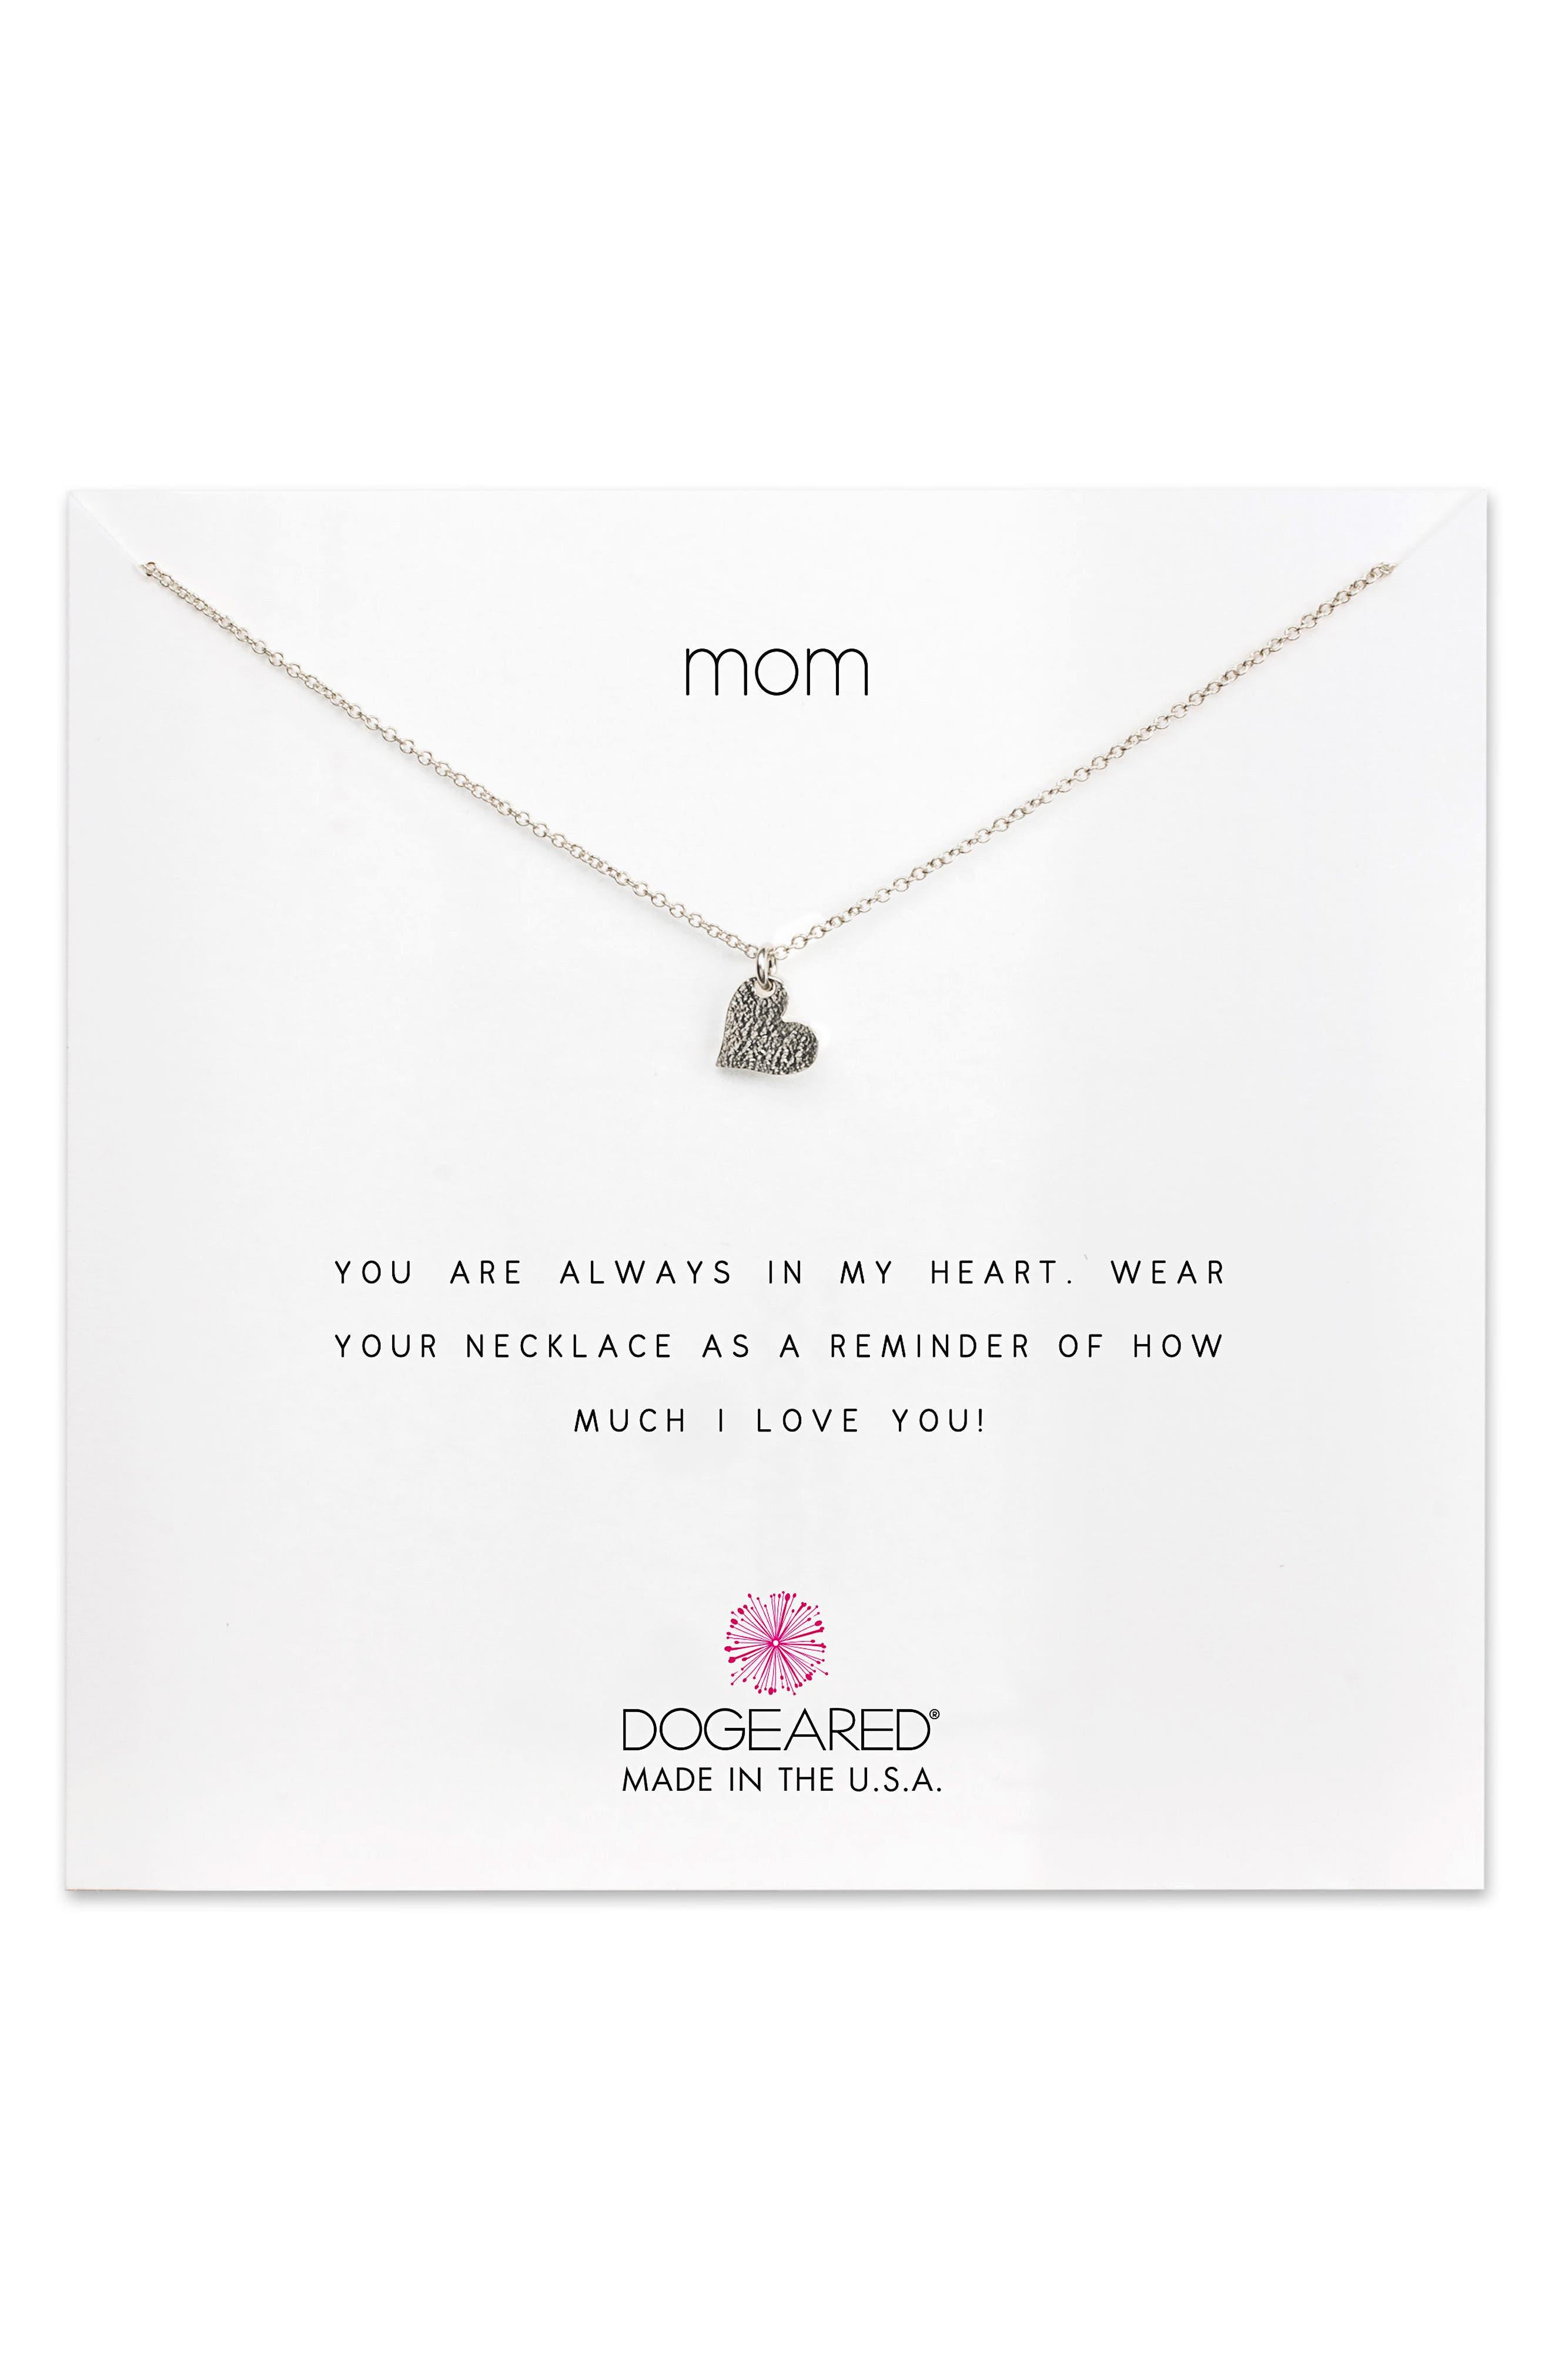 Mom Pendant Necklace,                             Main thumbnail 1, color,                             042